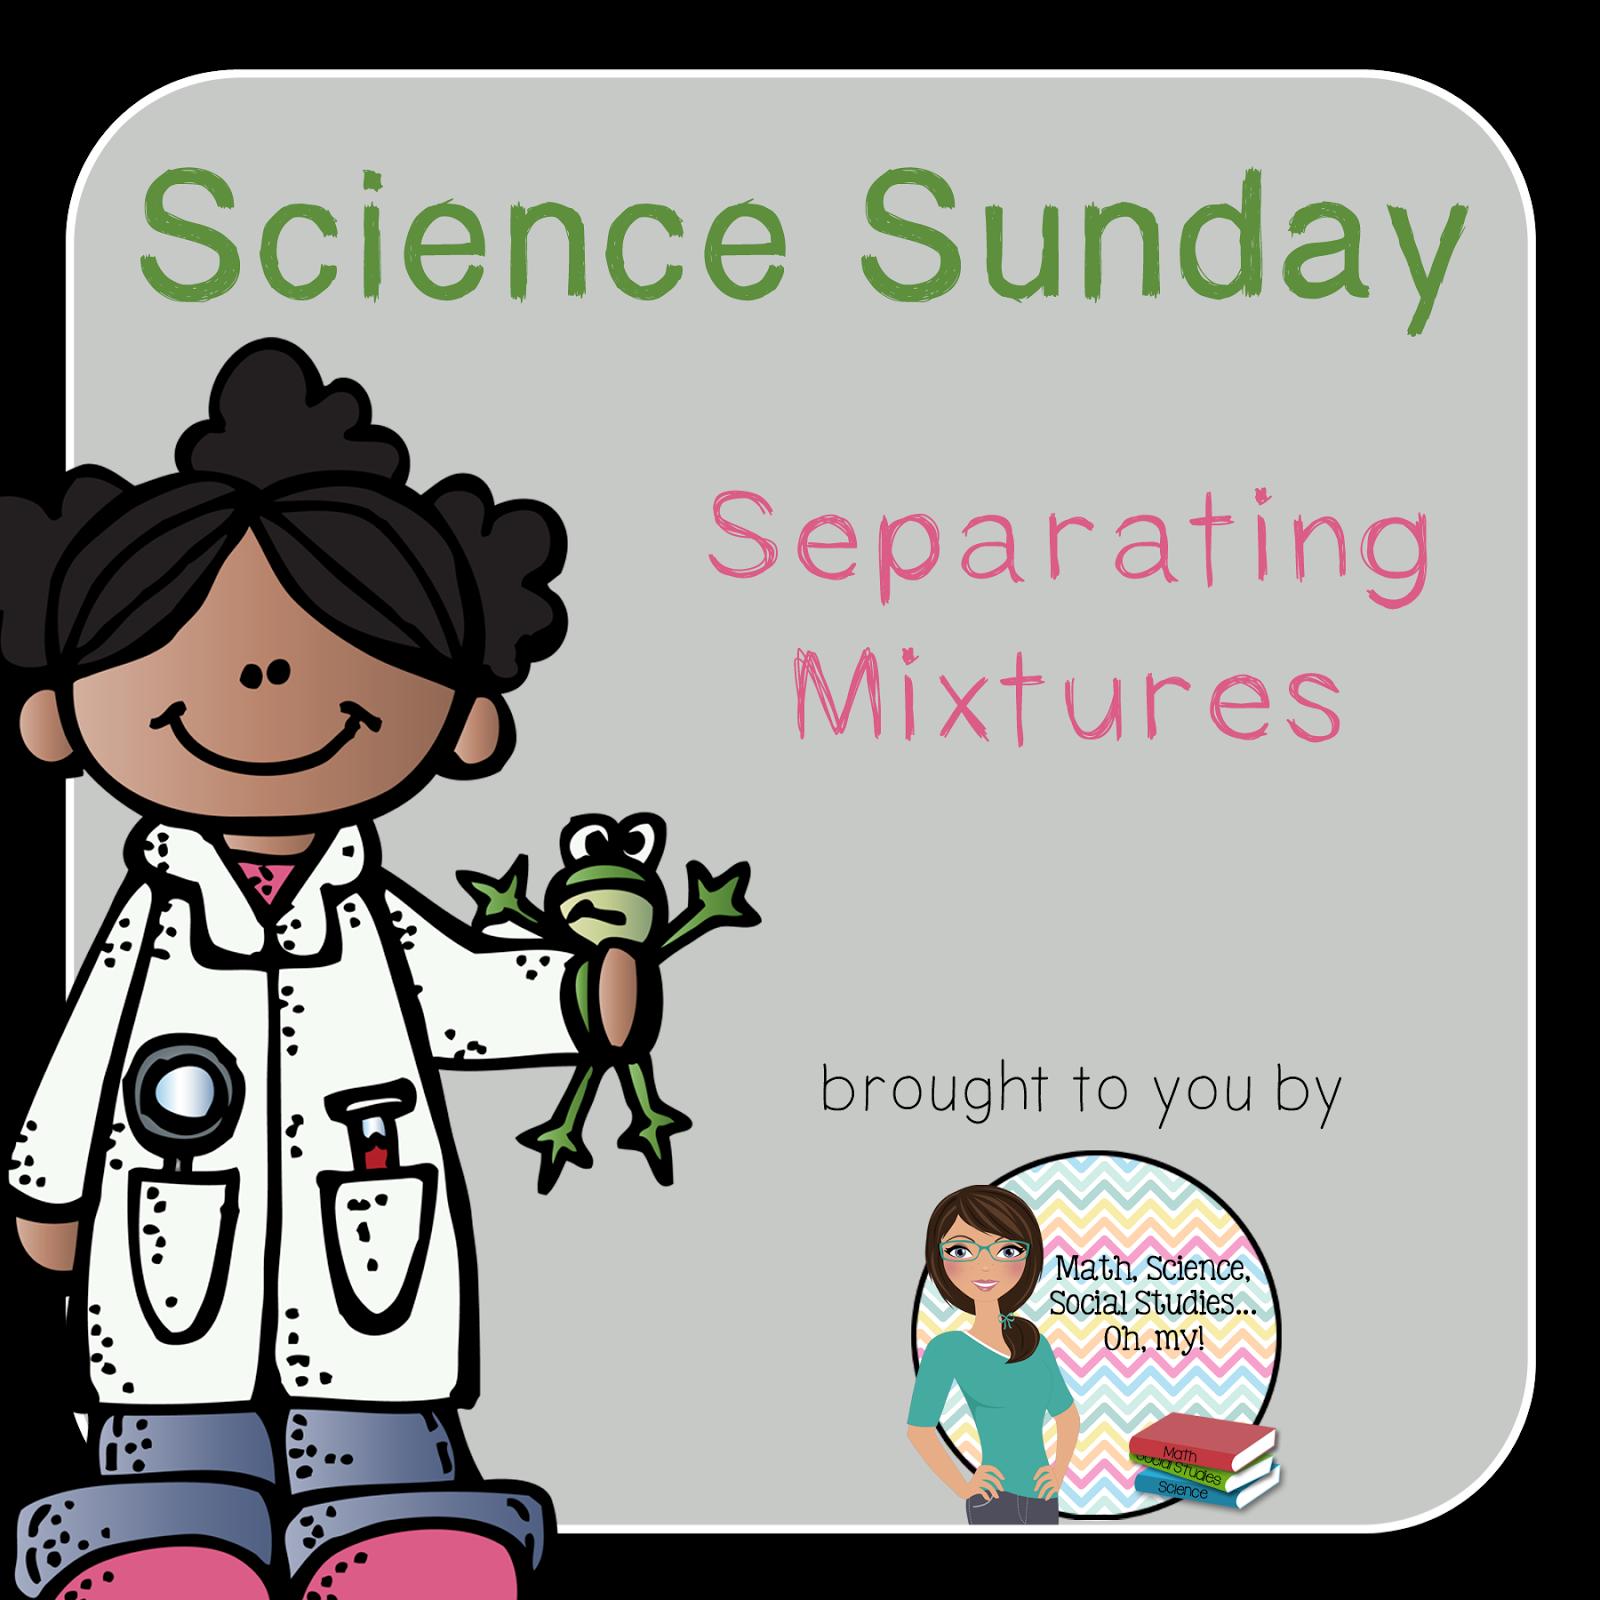 Math Science Social Stu S Oh My Science Sunday